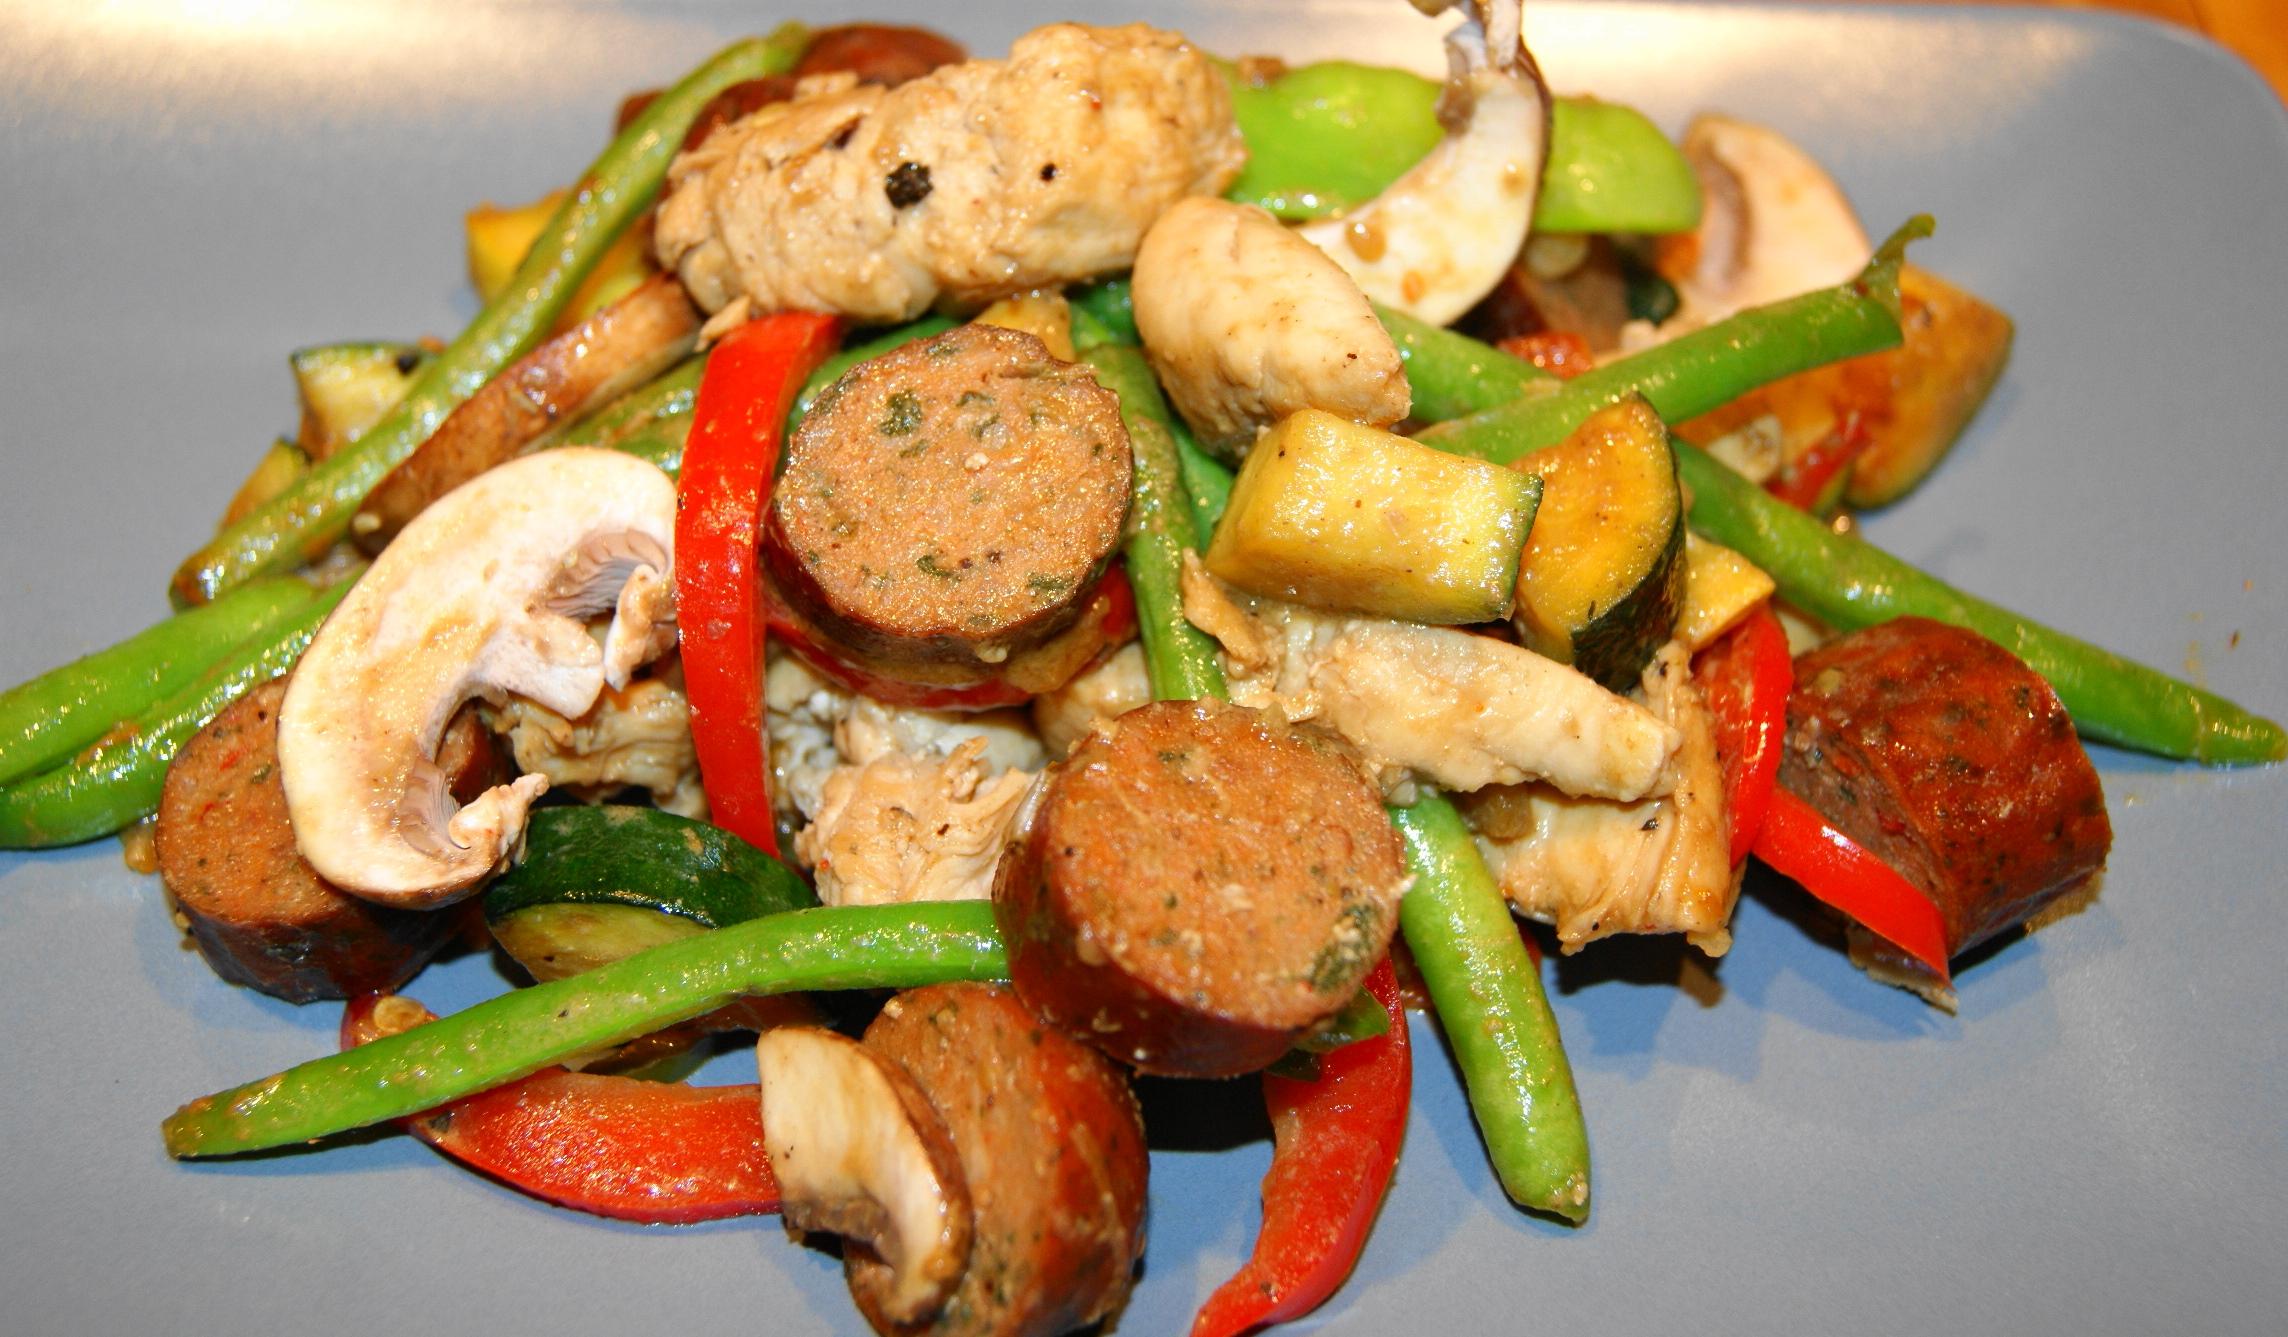 Chicken Stir Fry with Tahini Sauce